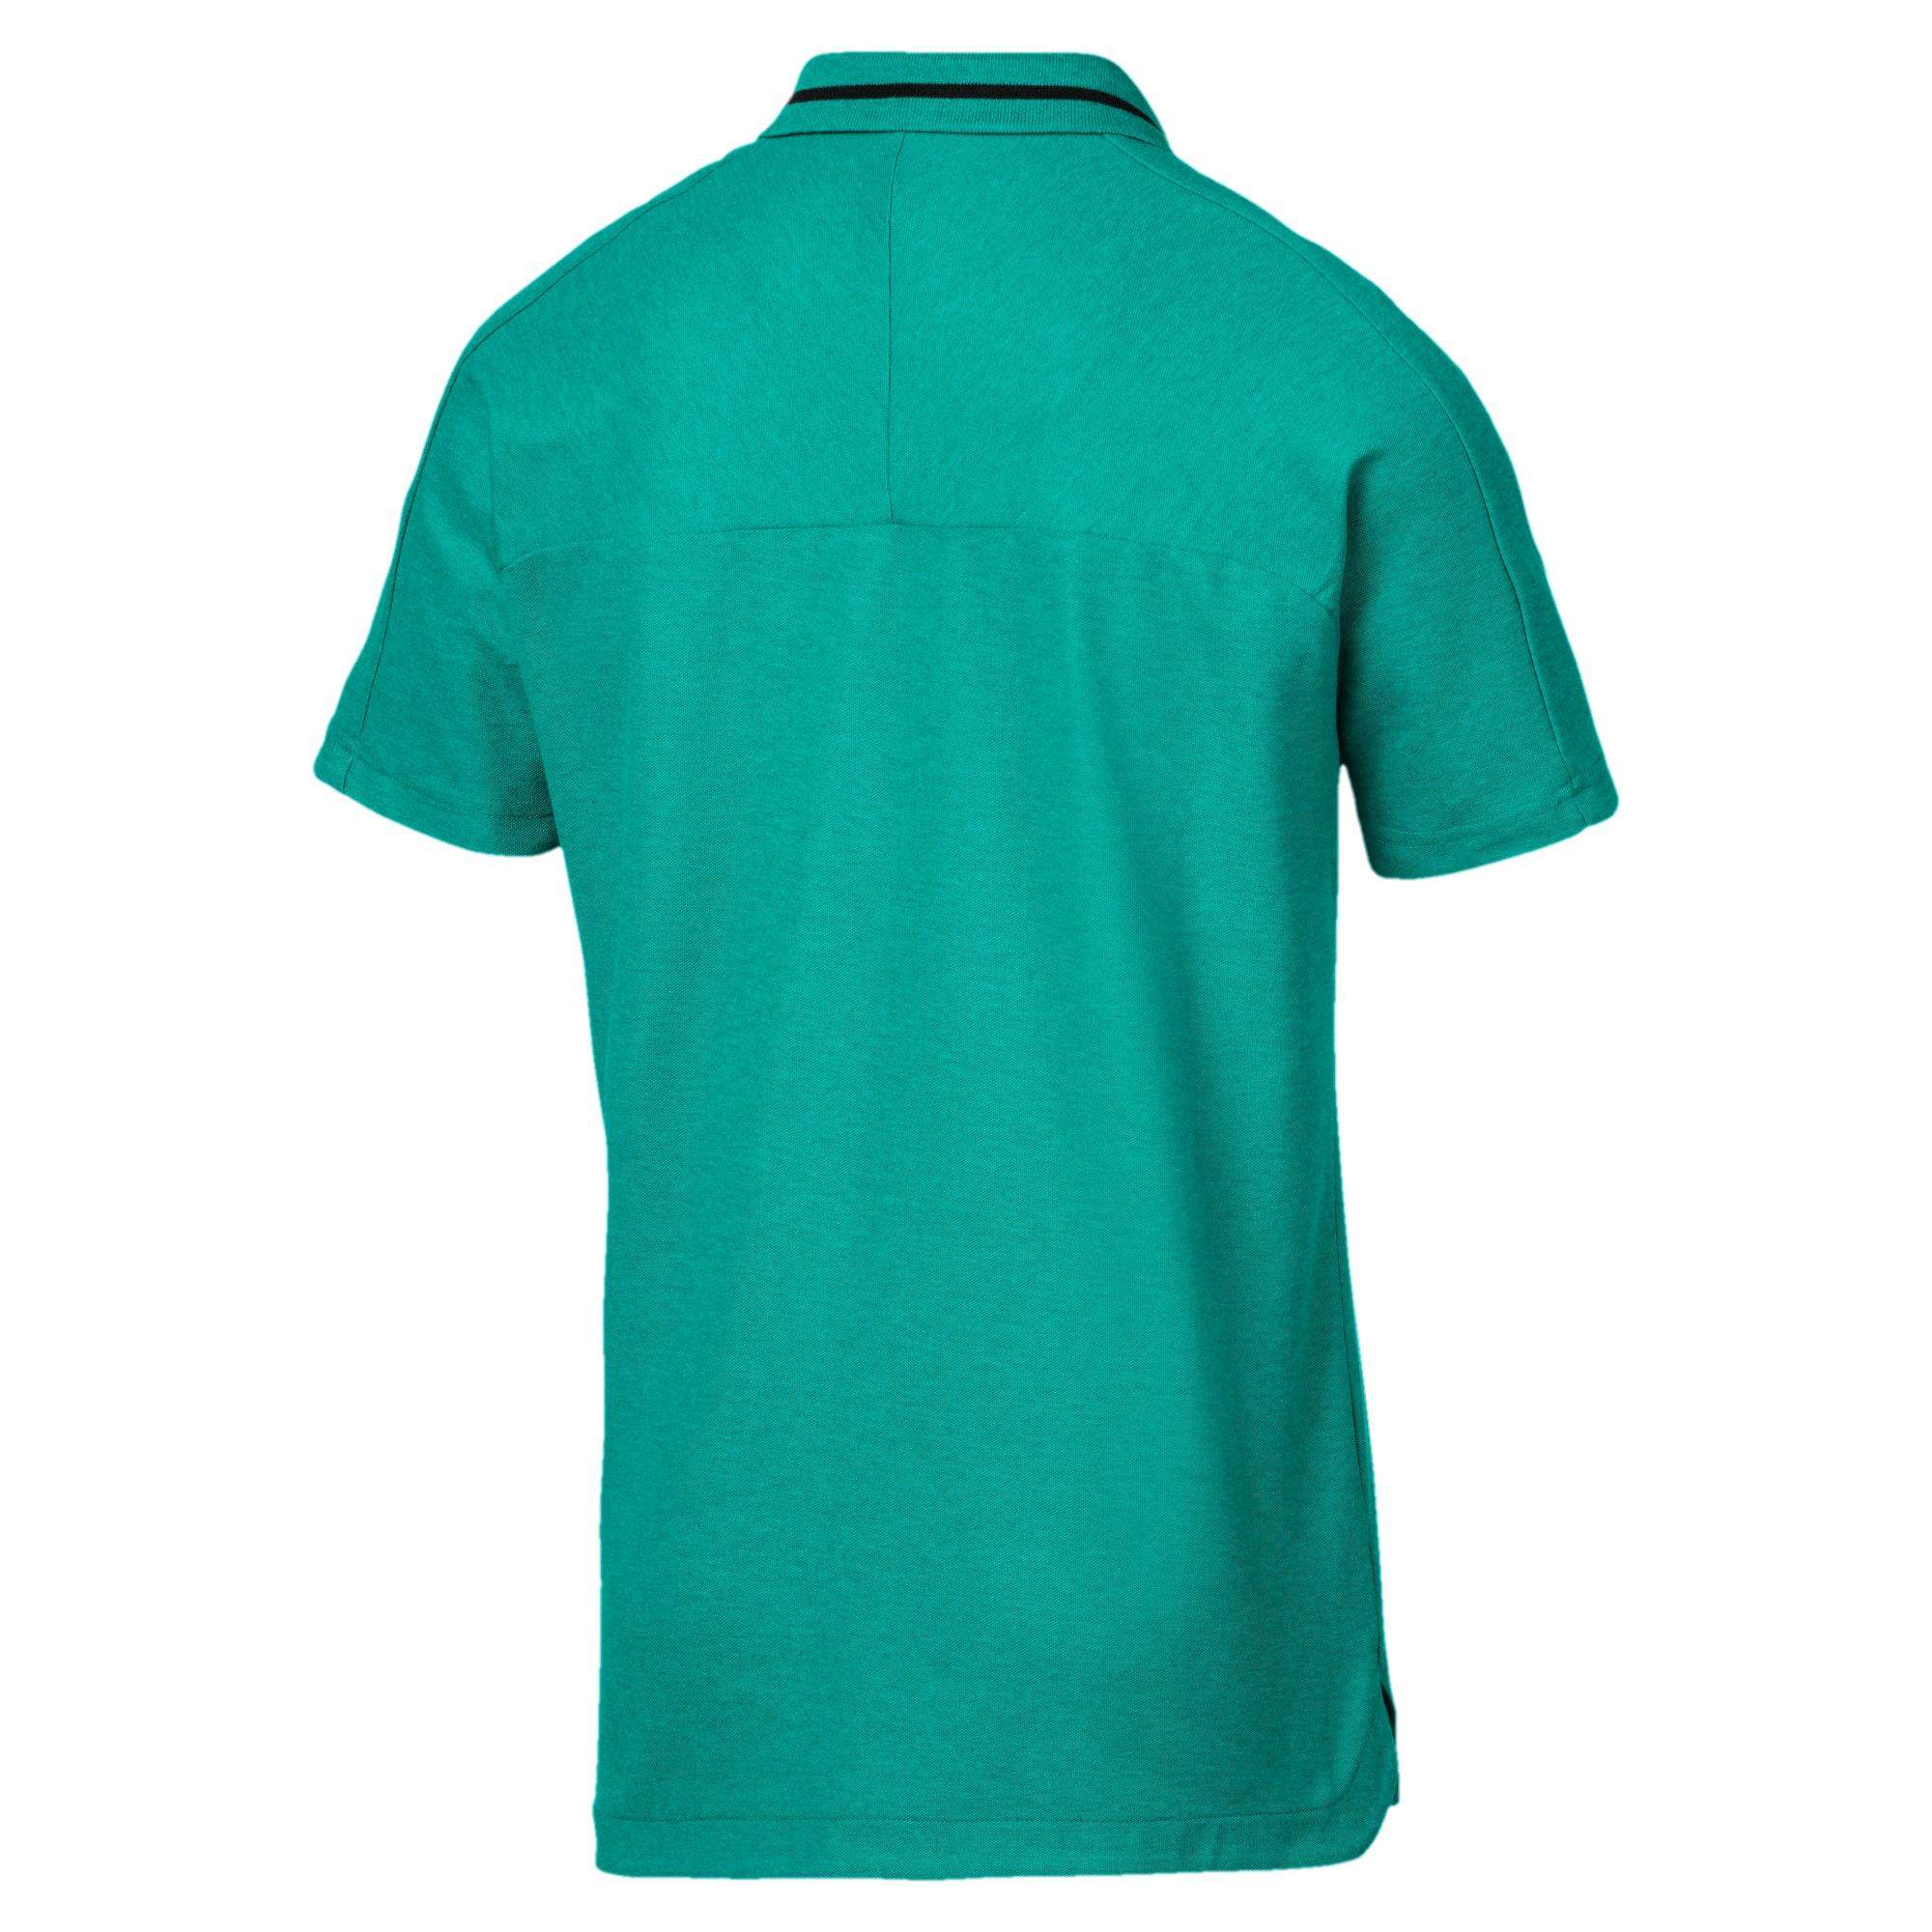 Thumbnail 5 of Mercedes AMG Petronas Men's Polo Shirt, Spectra Green Heather, medium